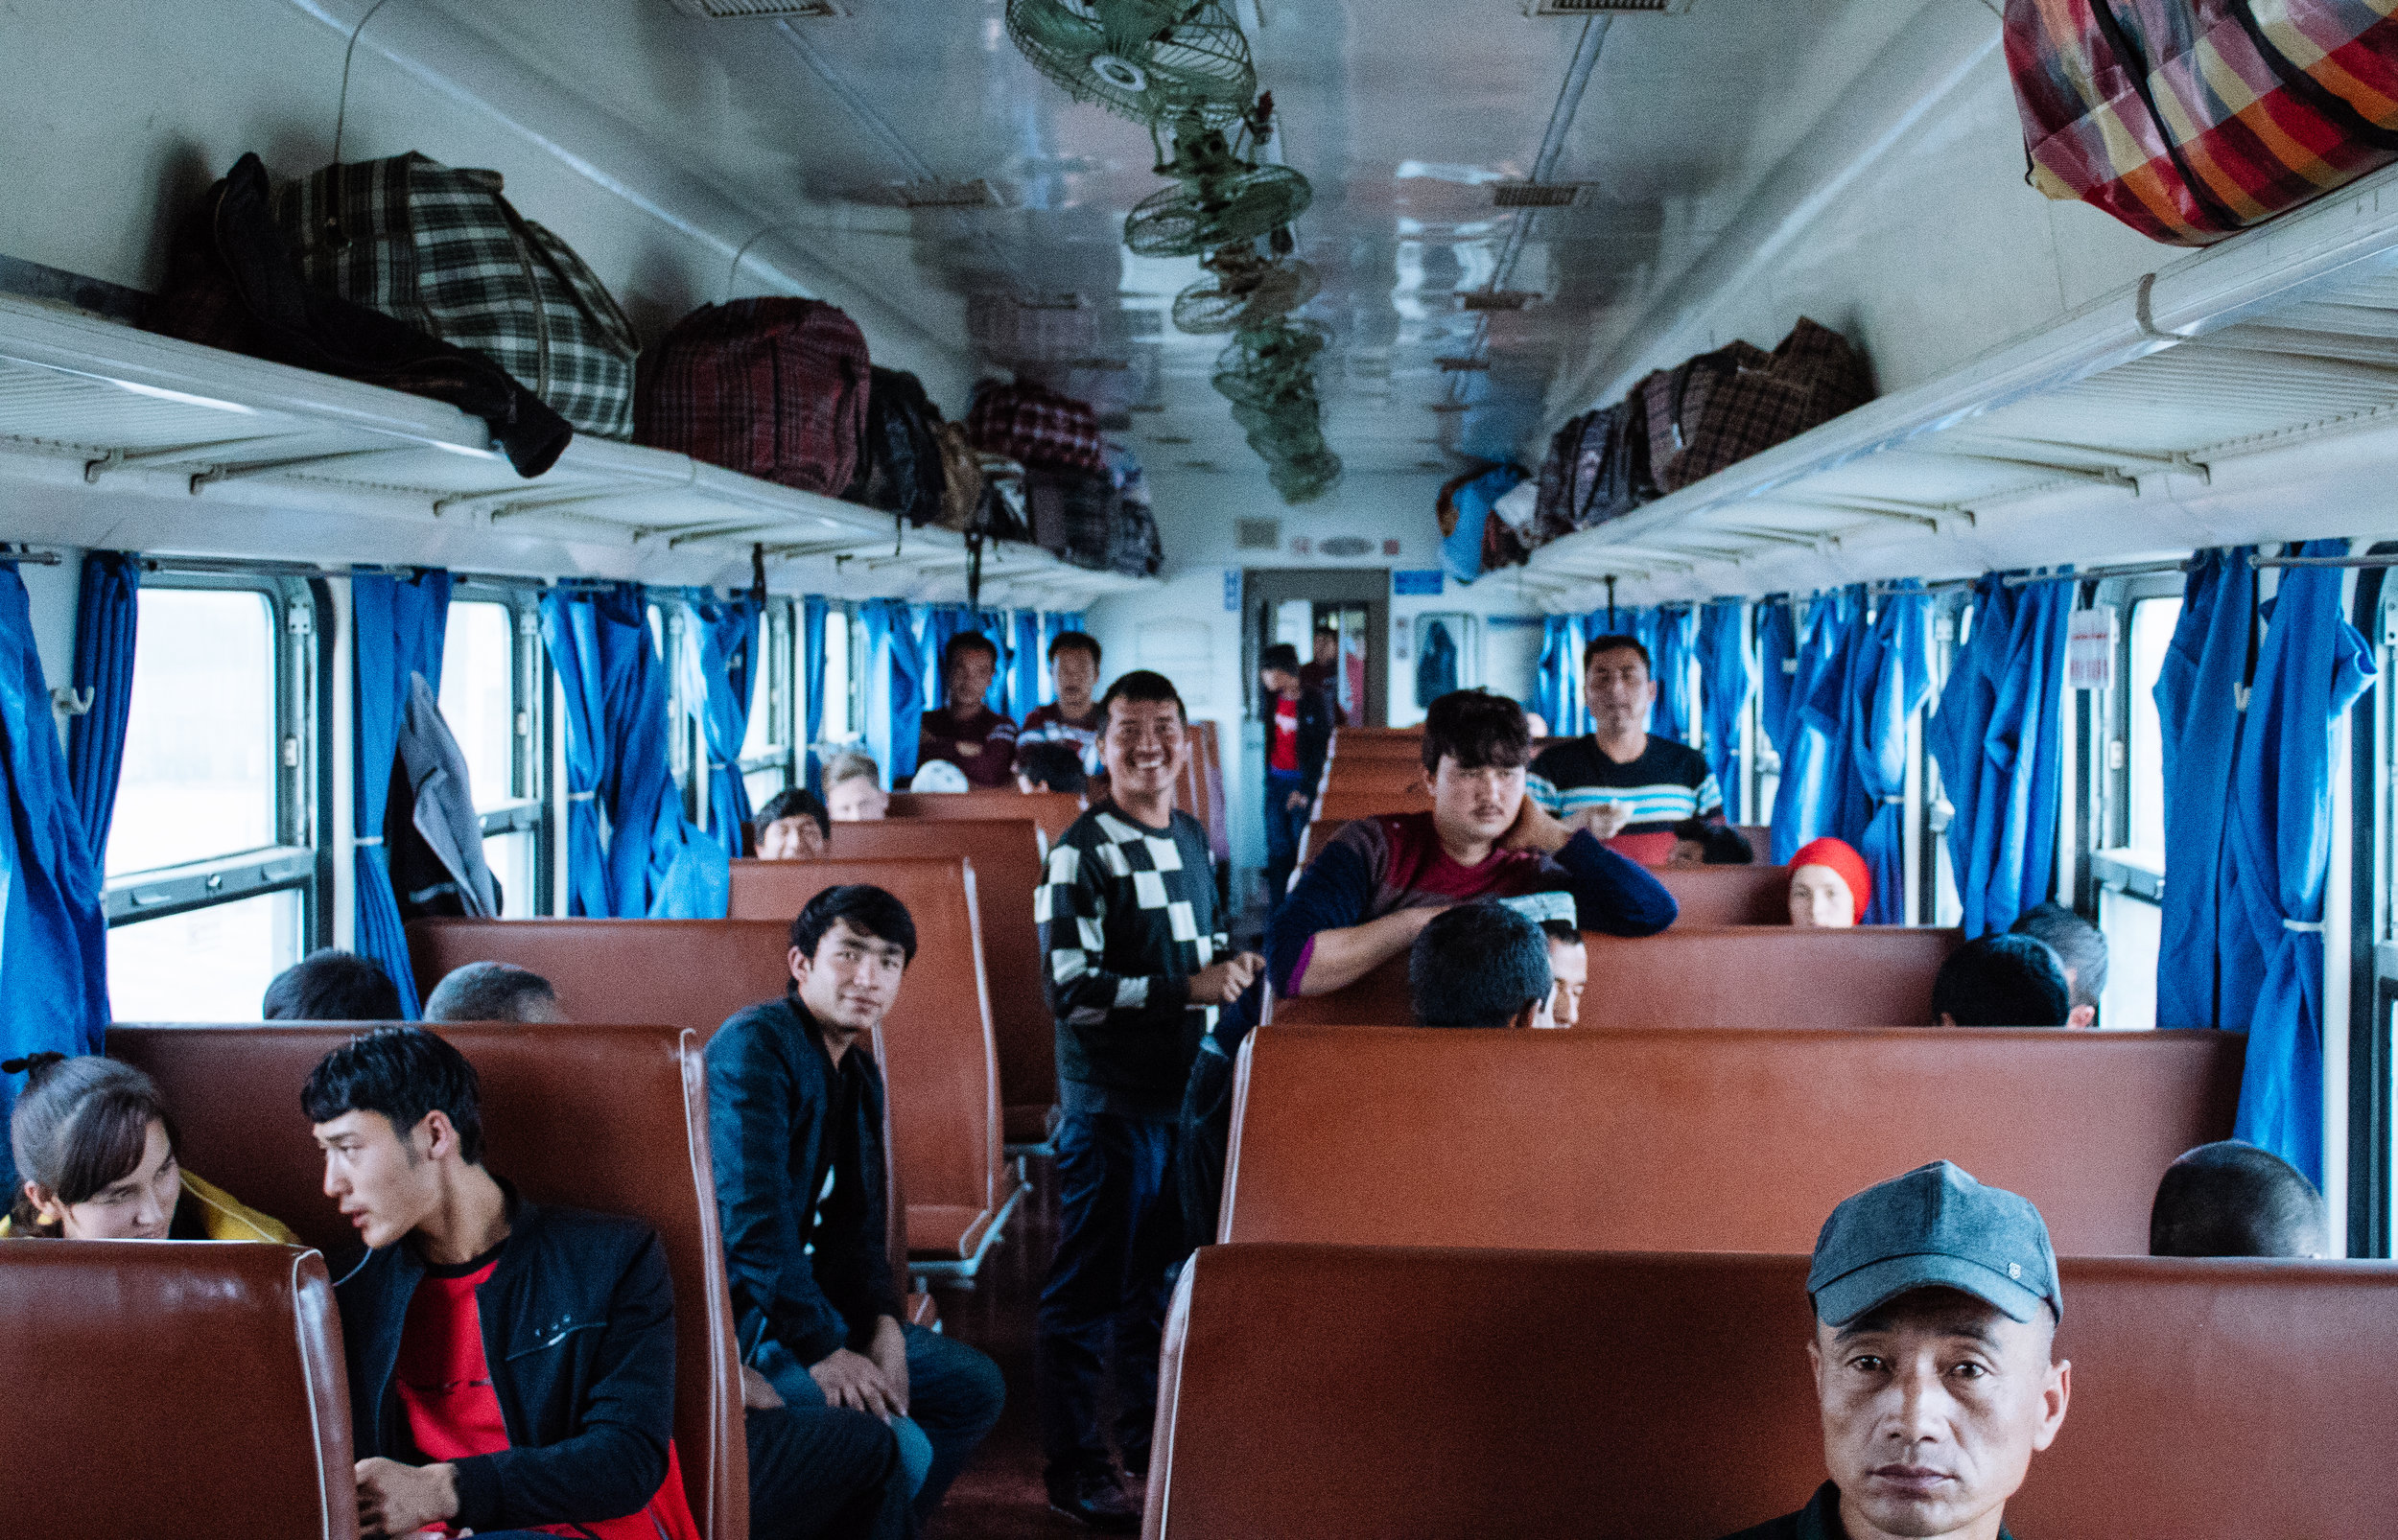 Taking the train to Hotan from Kashgar